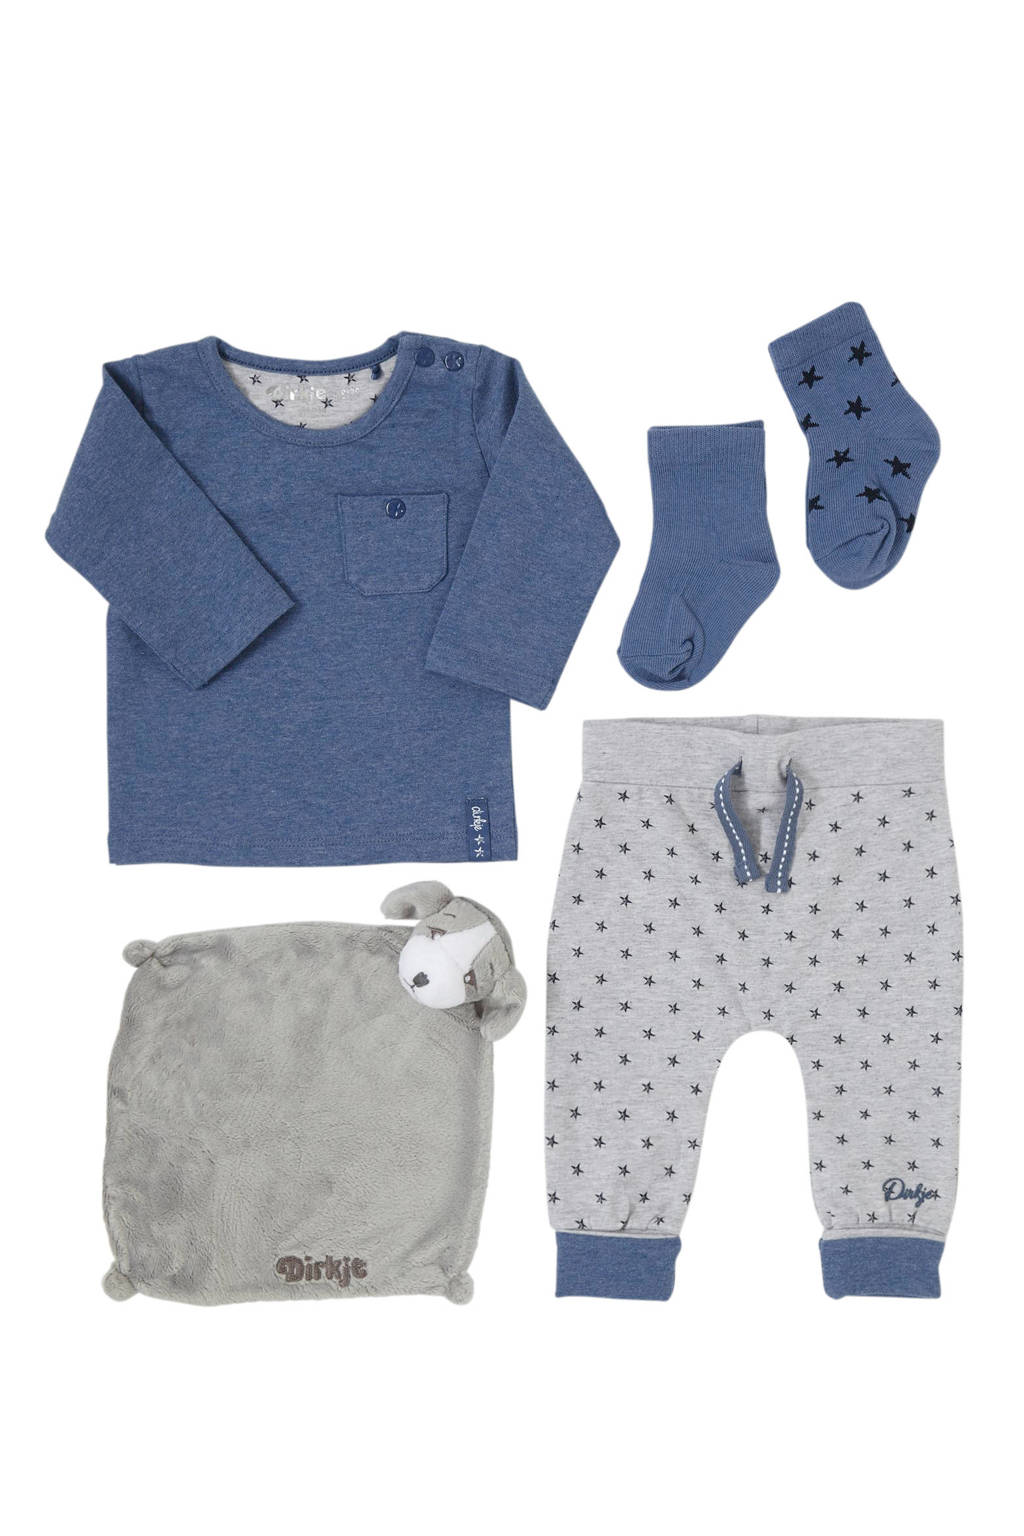 Dirkje newborn baby longsleeve + broek + sokken+ knuffel, Vergrijsd blauw/ grijs melange